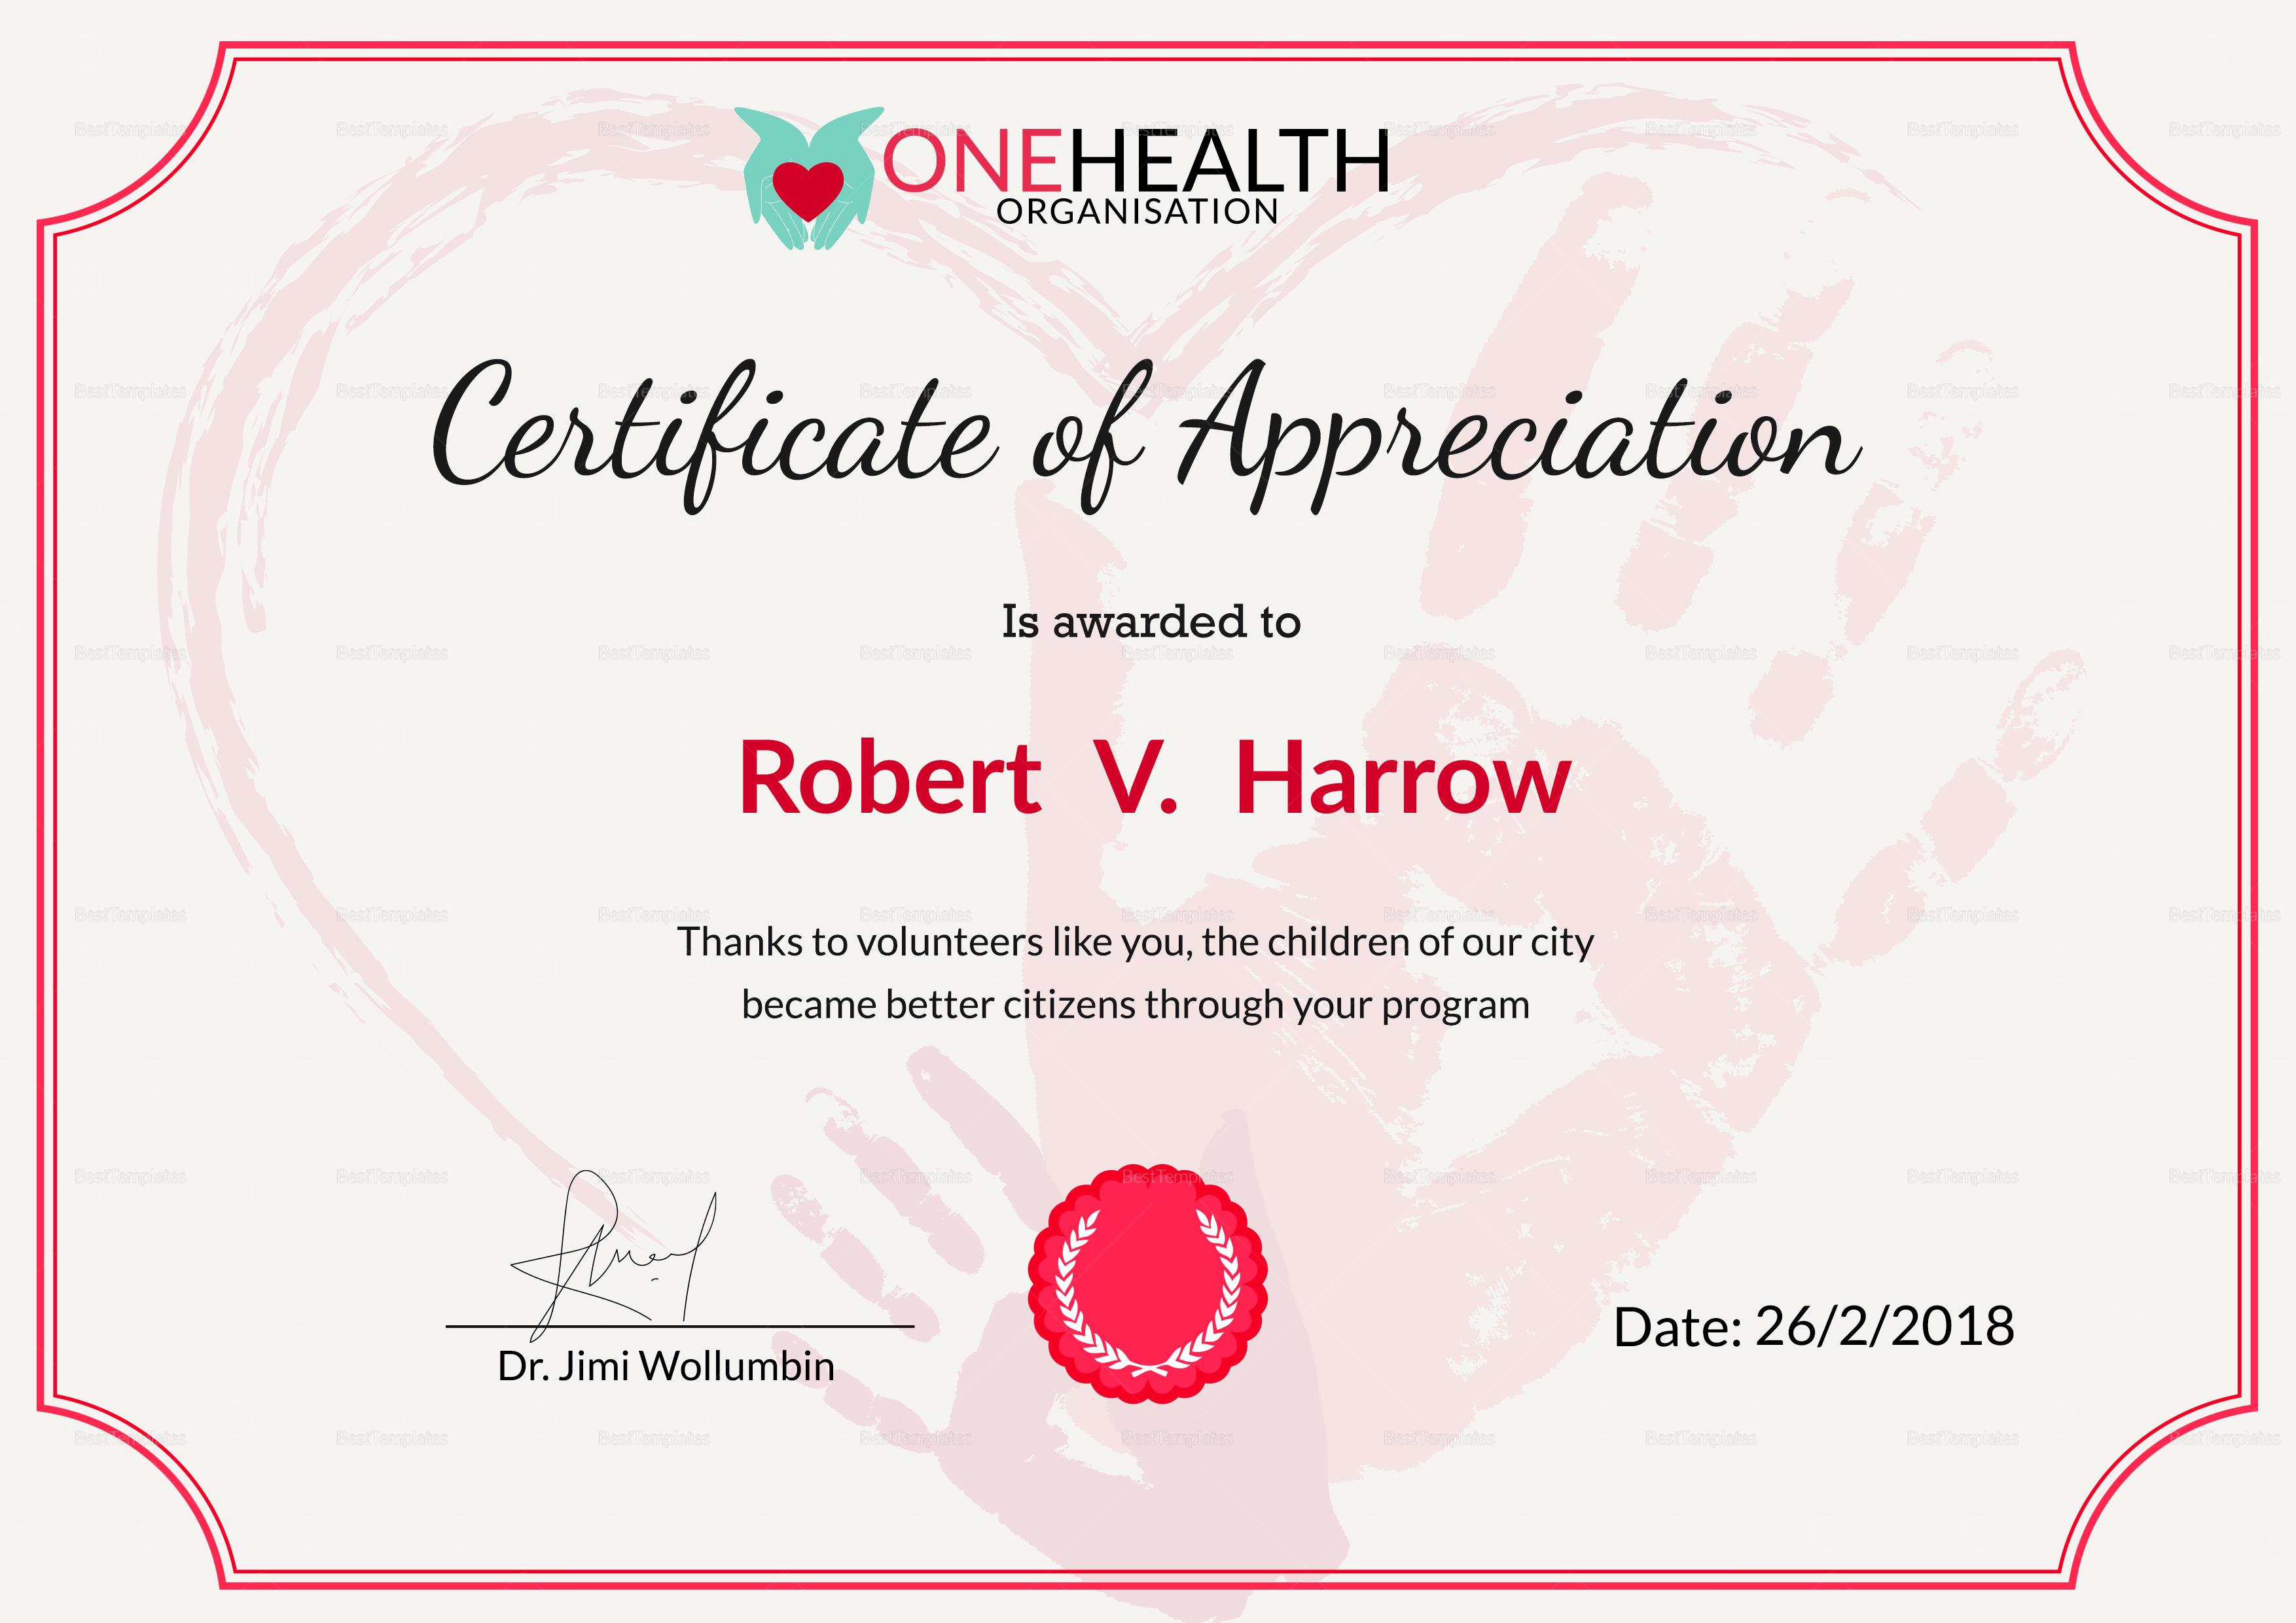 Health Appreciation Certificate Design Template